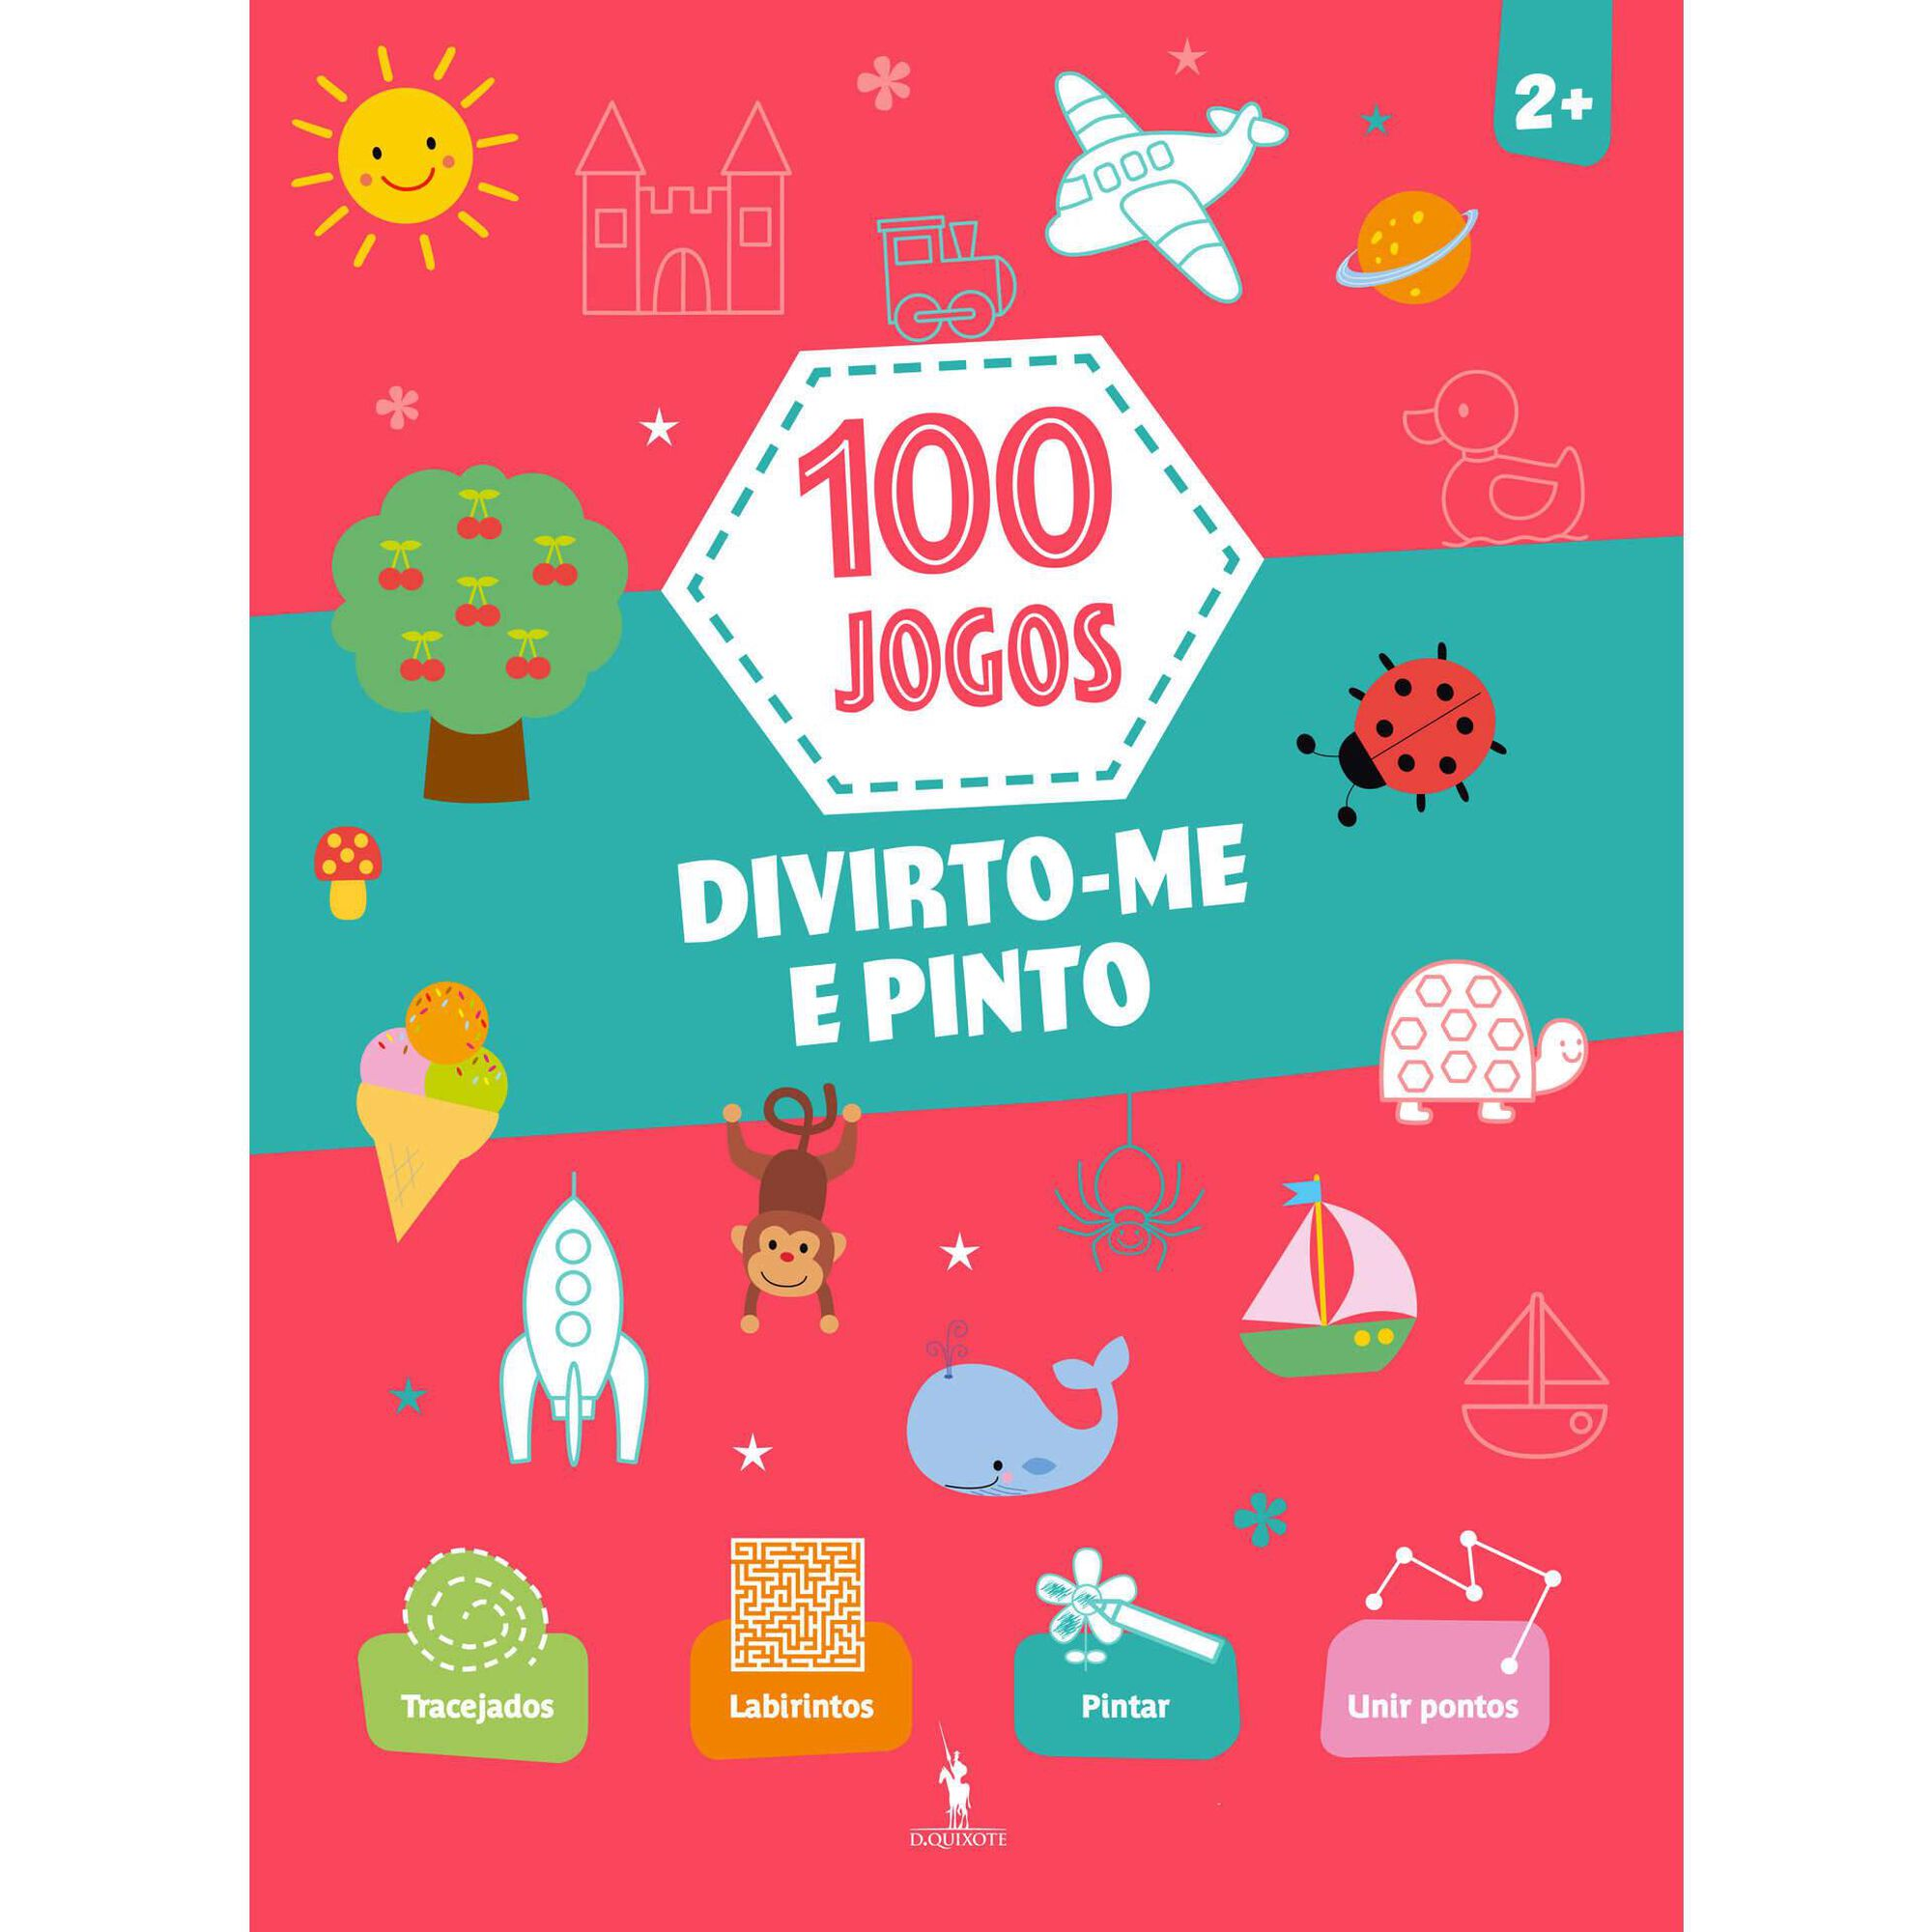 100 Jogos - Divirto-me e Pinto